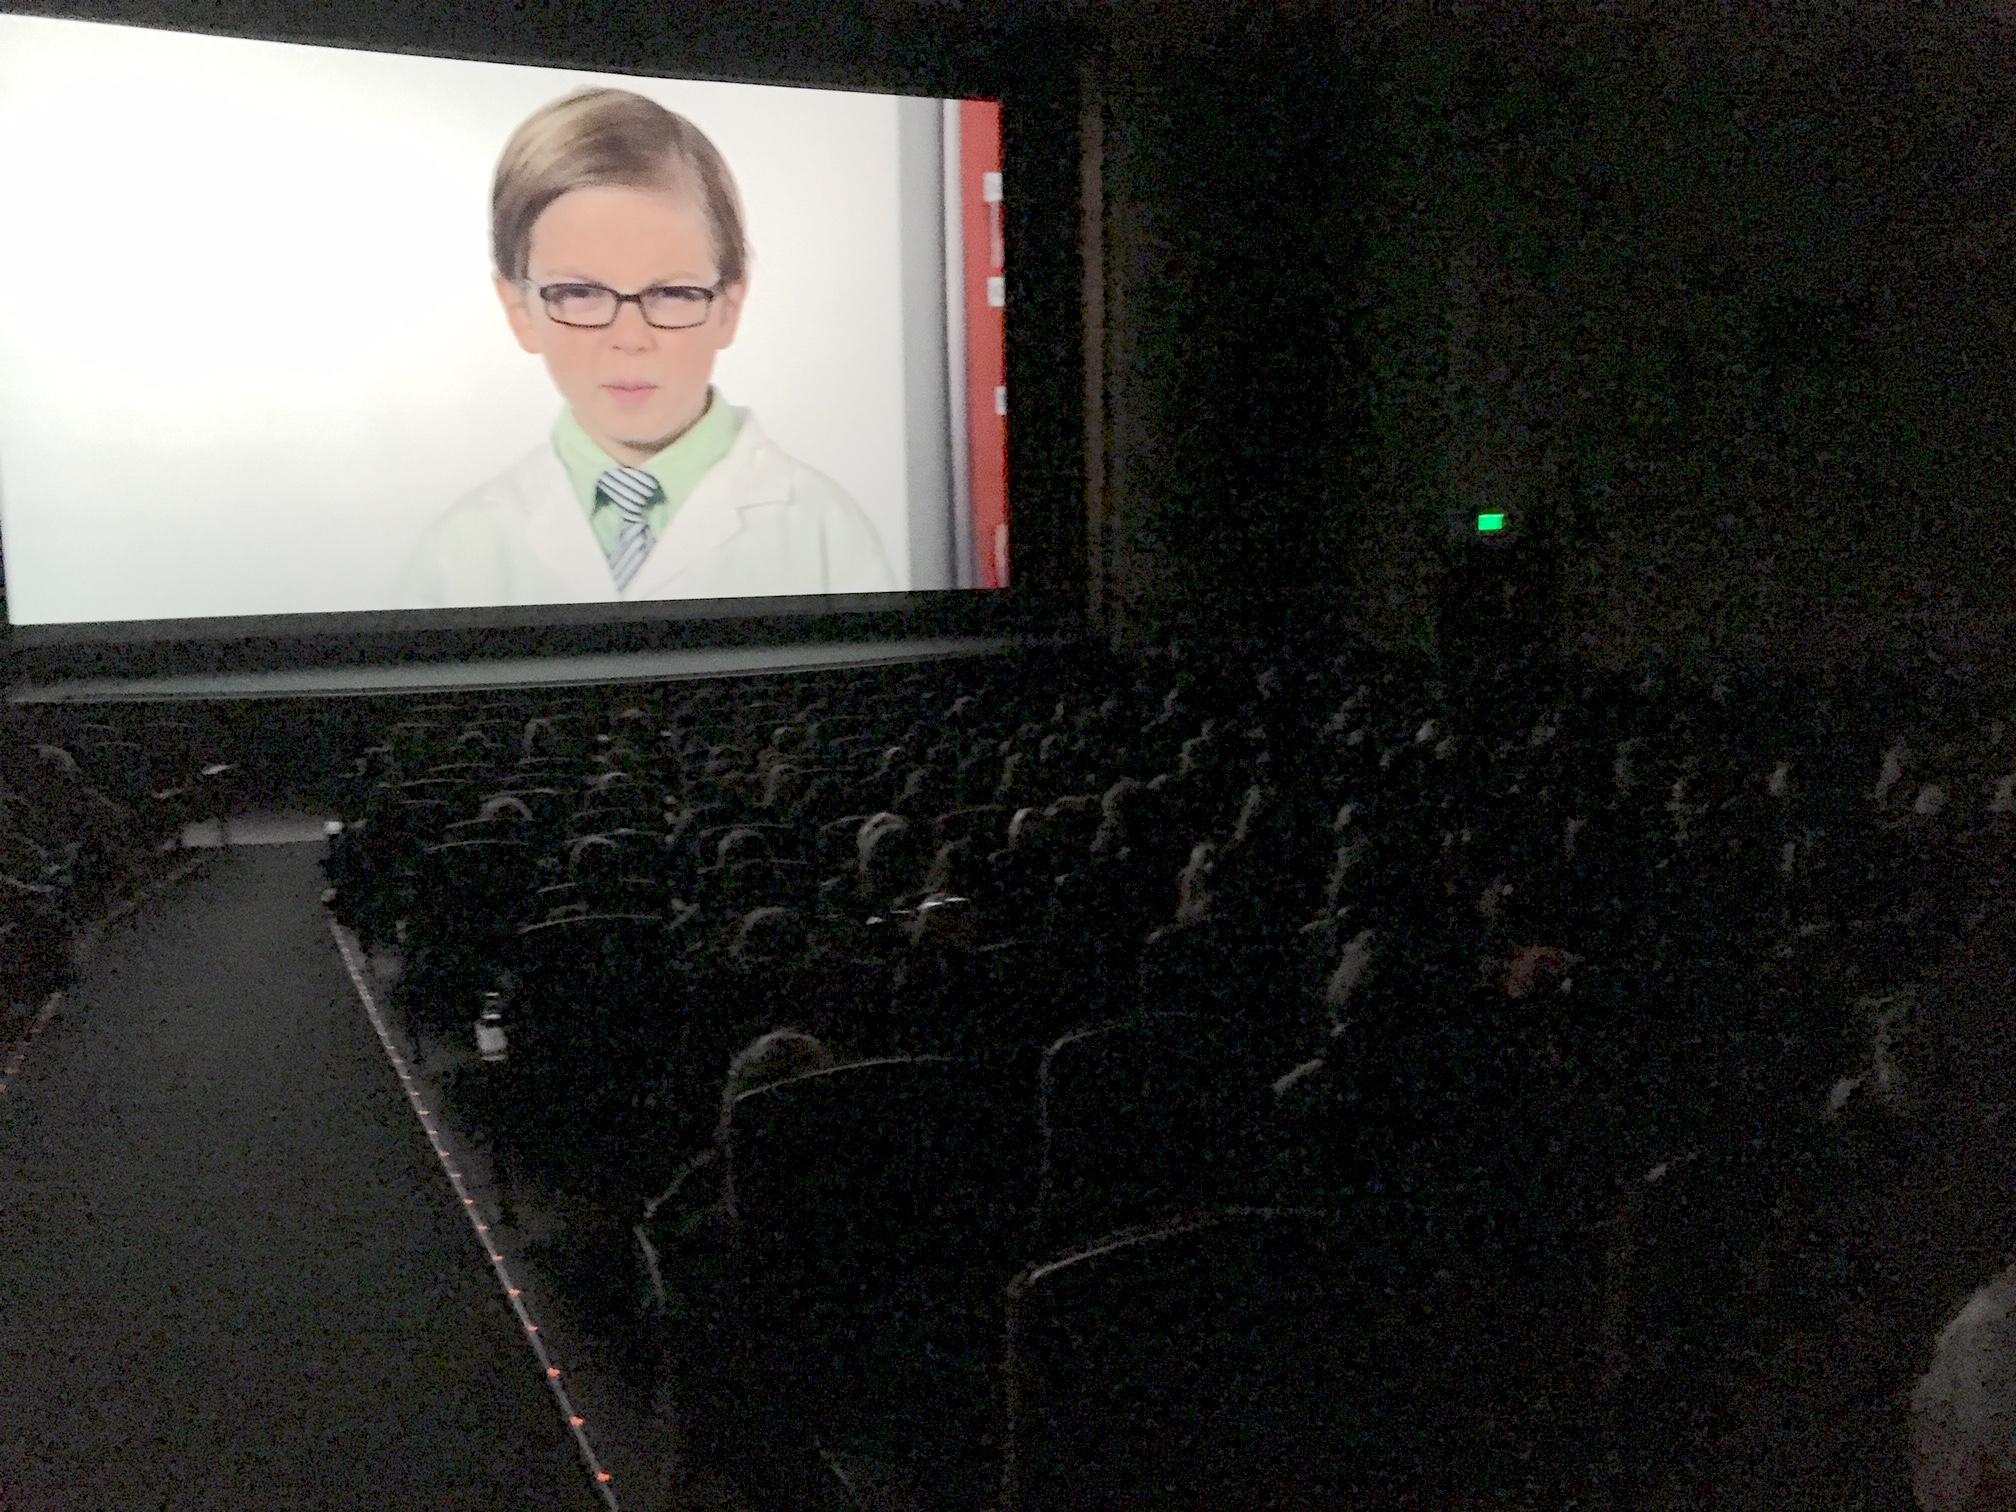 Elliot on the giant screen...